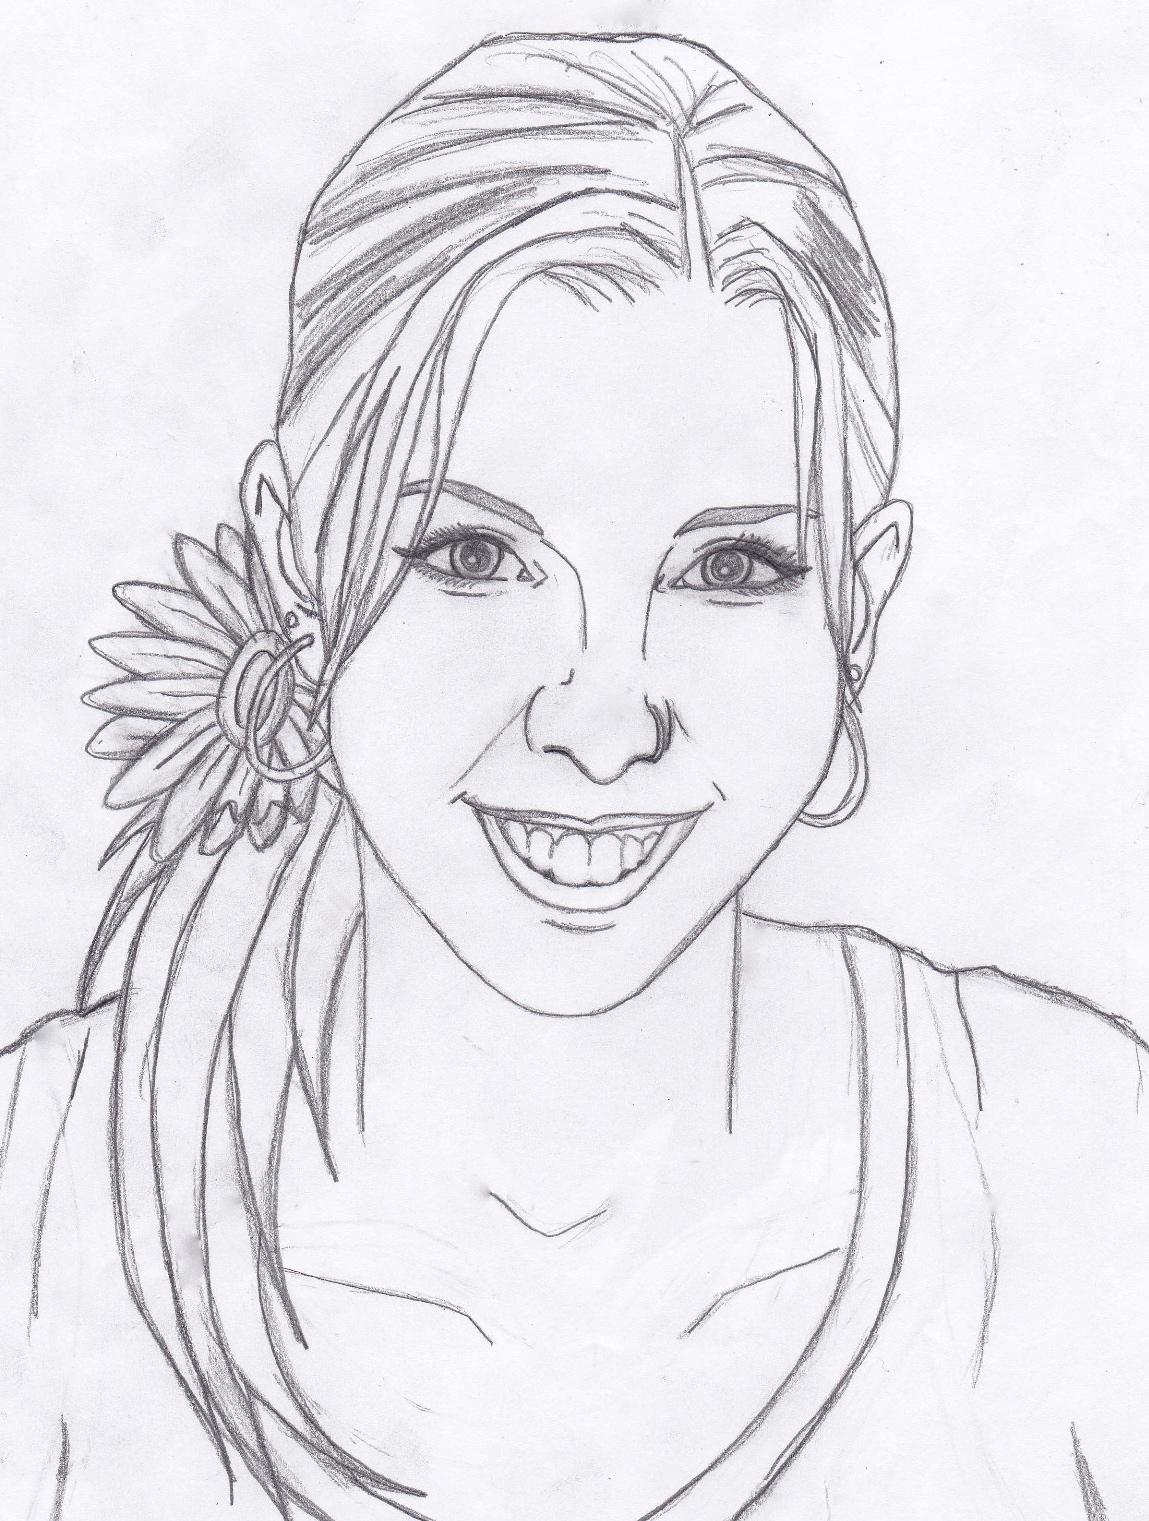 Self portrait sketch 1